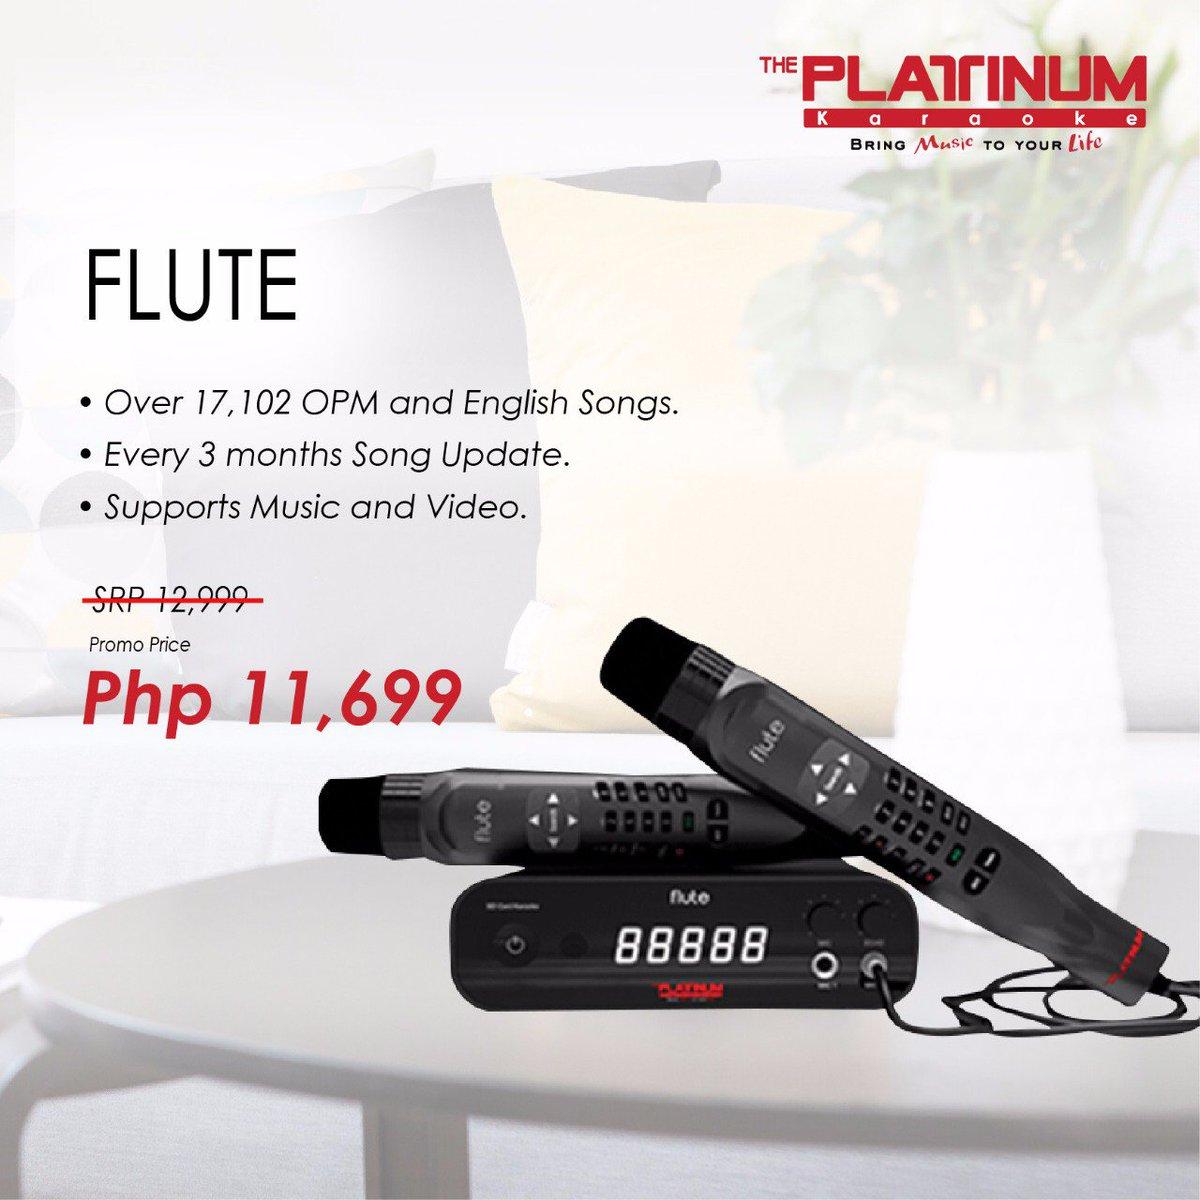 The Platinum Karaoke on Twitter: